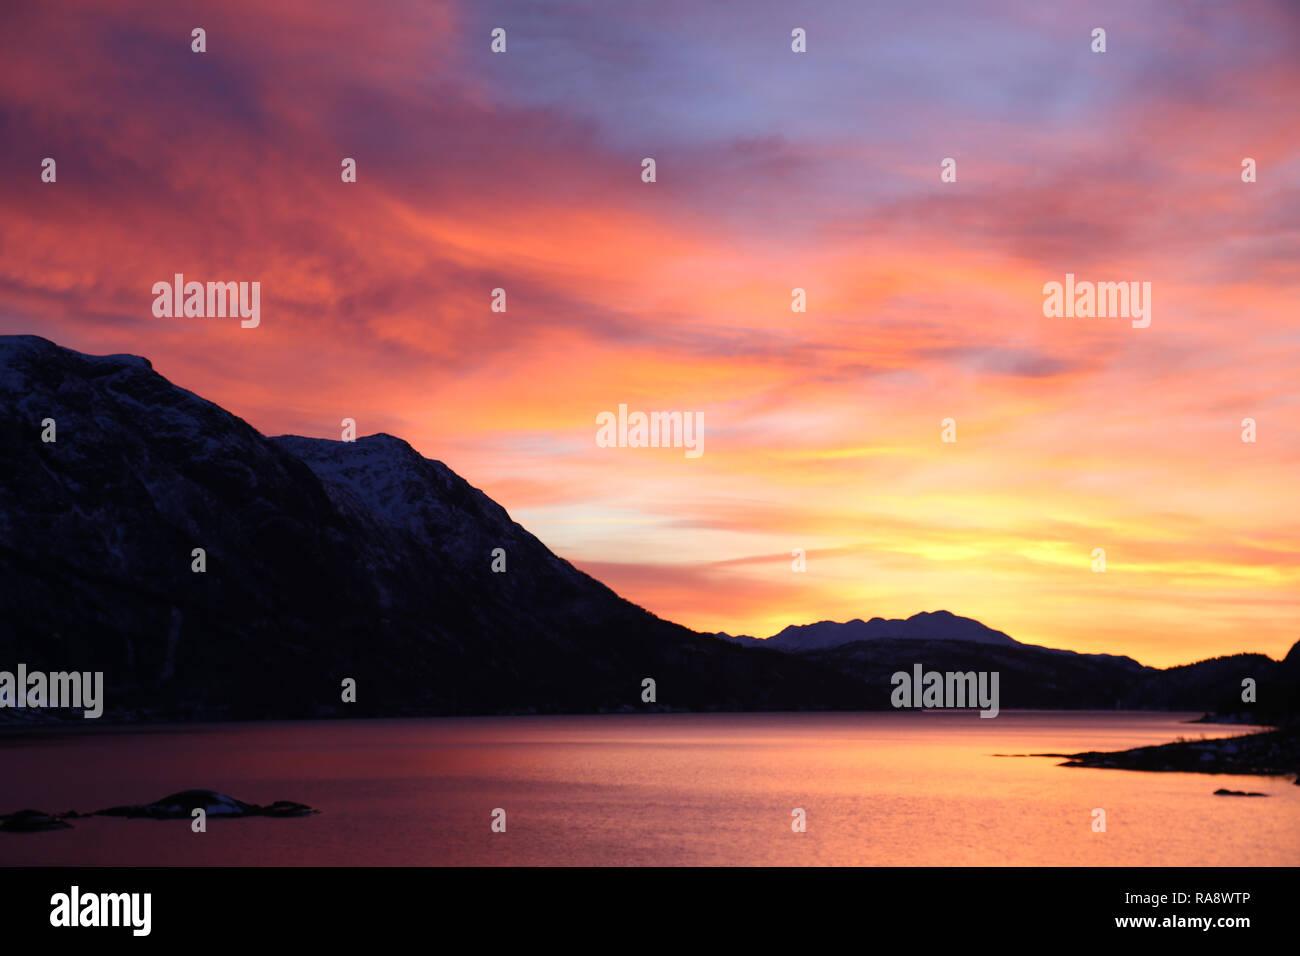 Stunning sunrise over lake and mountains - Stock Image